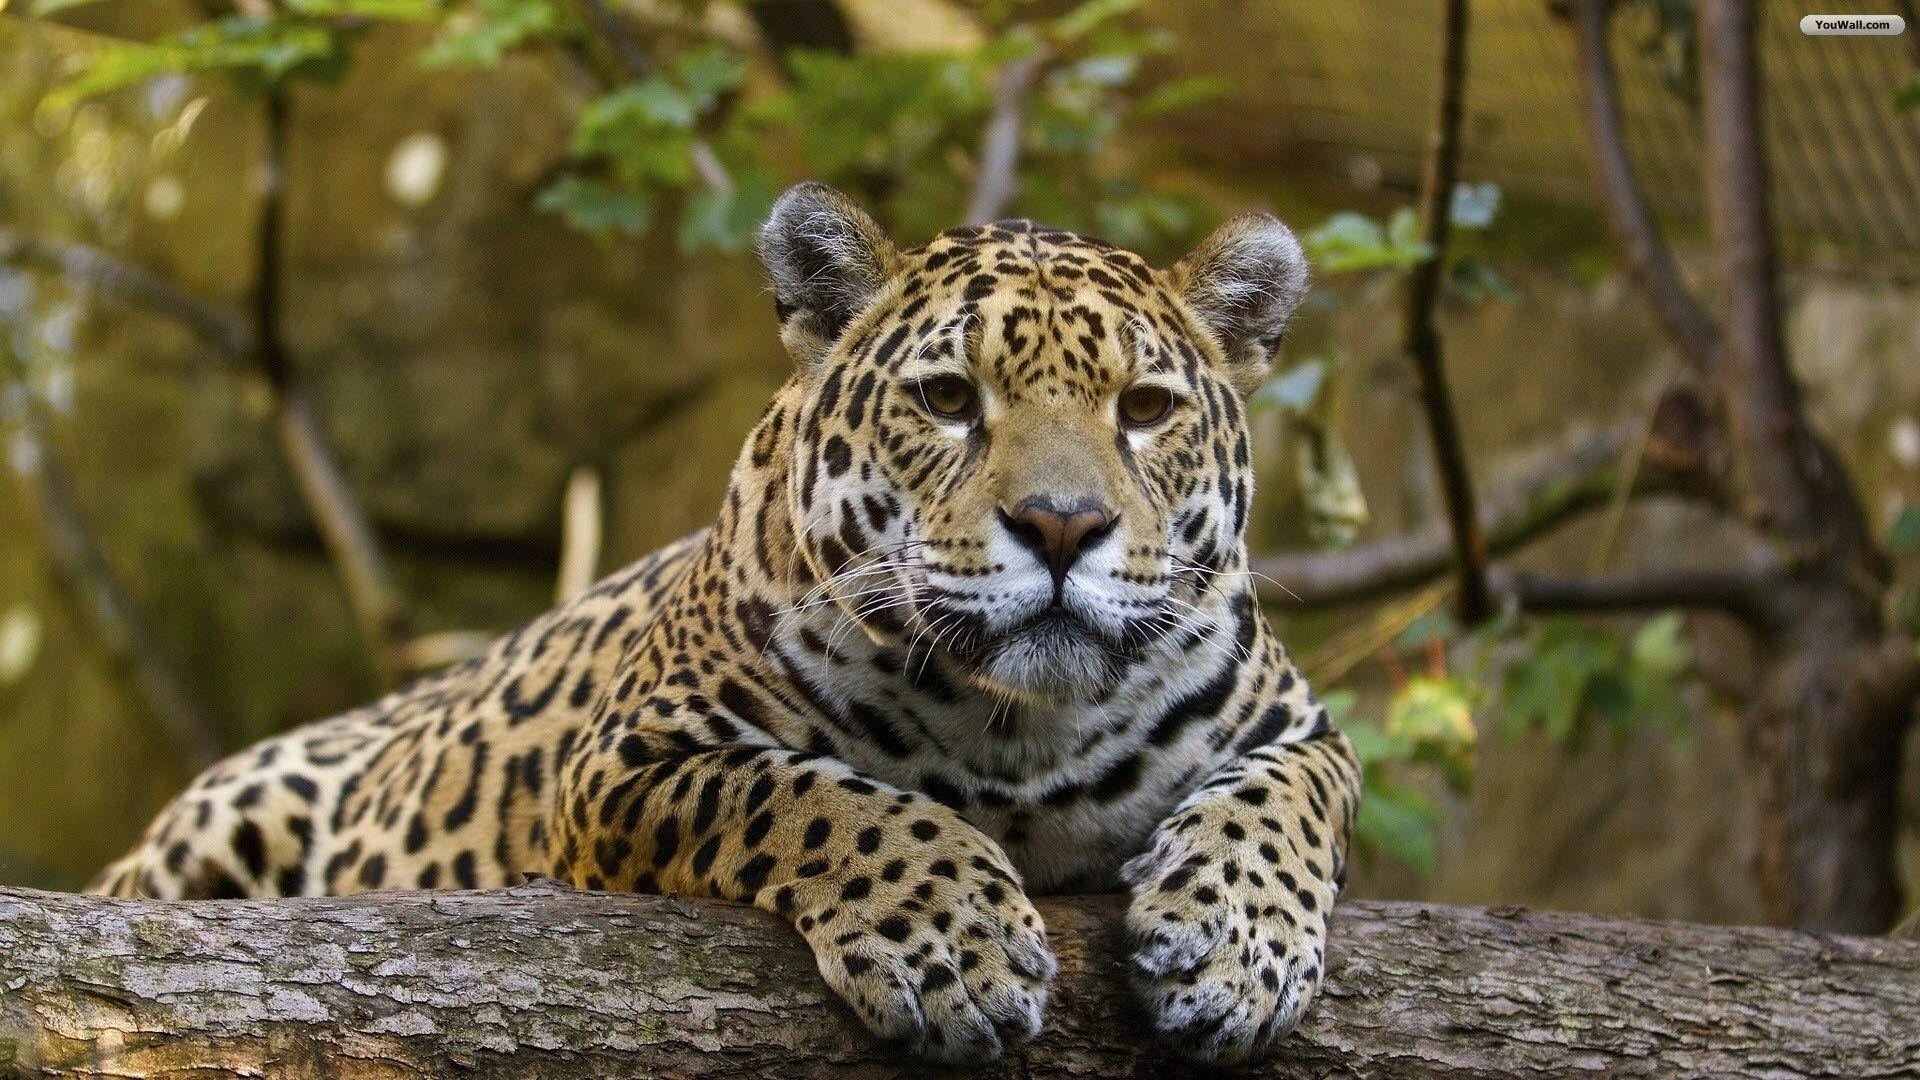 YouWall - Beautiful Jaguar Wallpaper - wallpaper,wallpapers,free ...